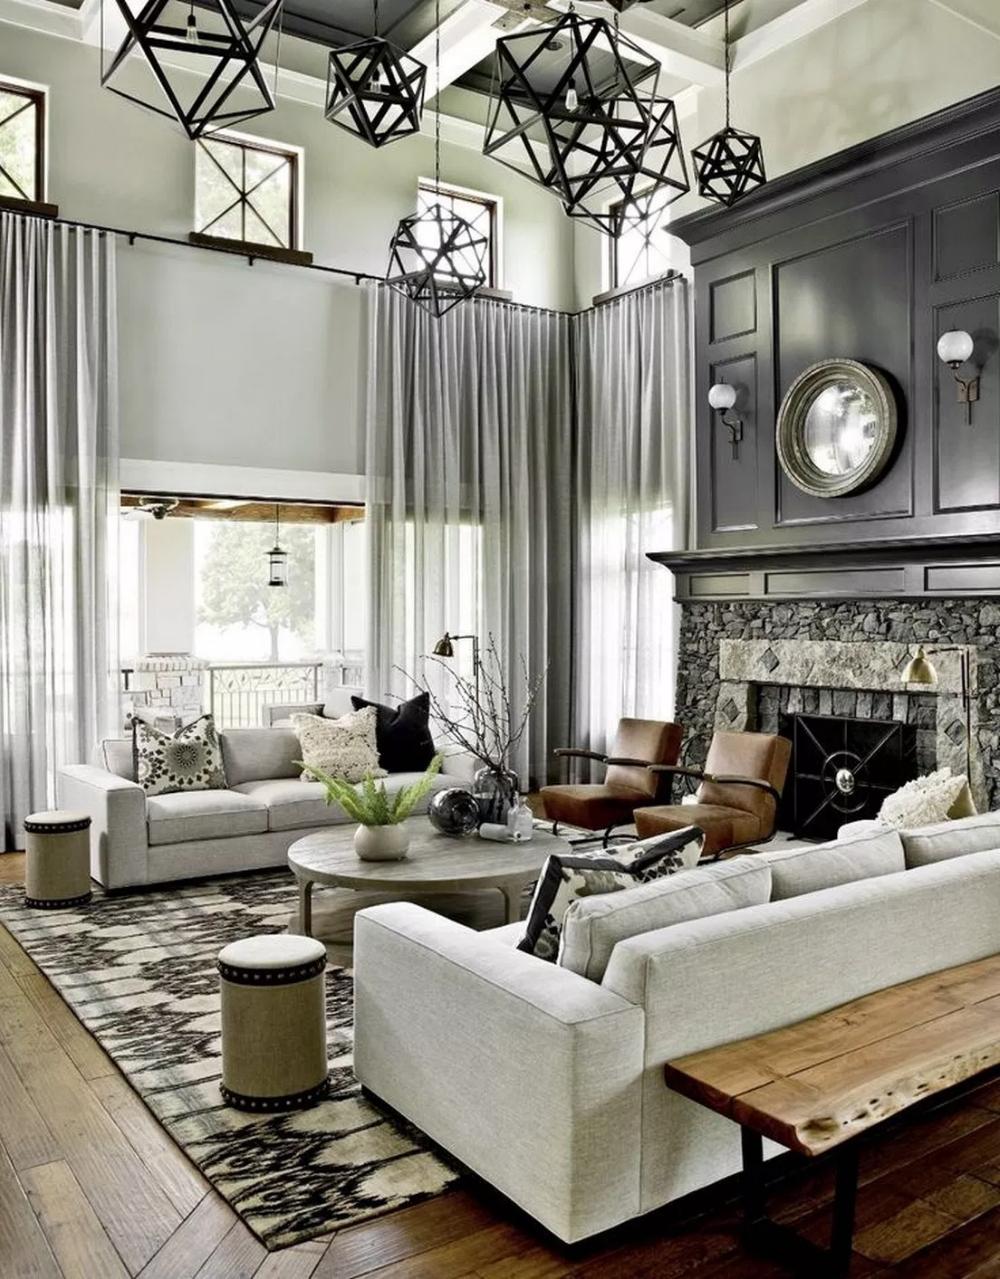 58 Amazing Farmhouse Living Room Design Ideas 6 Home